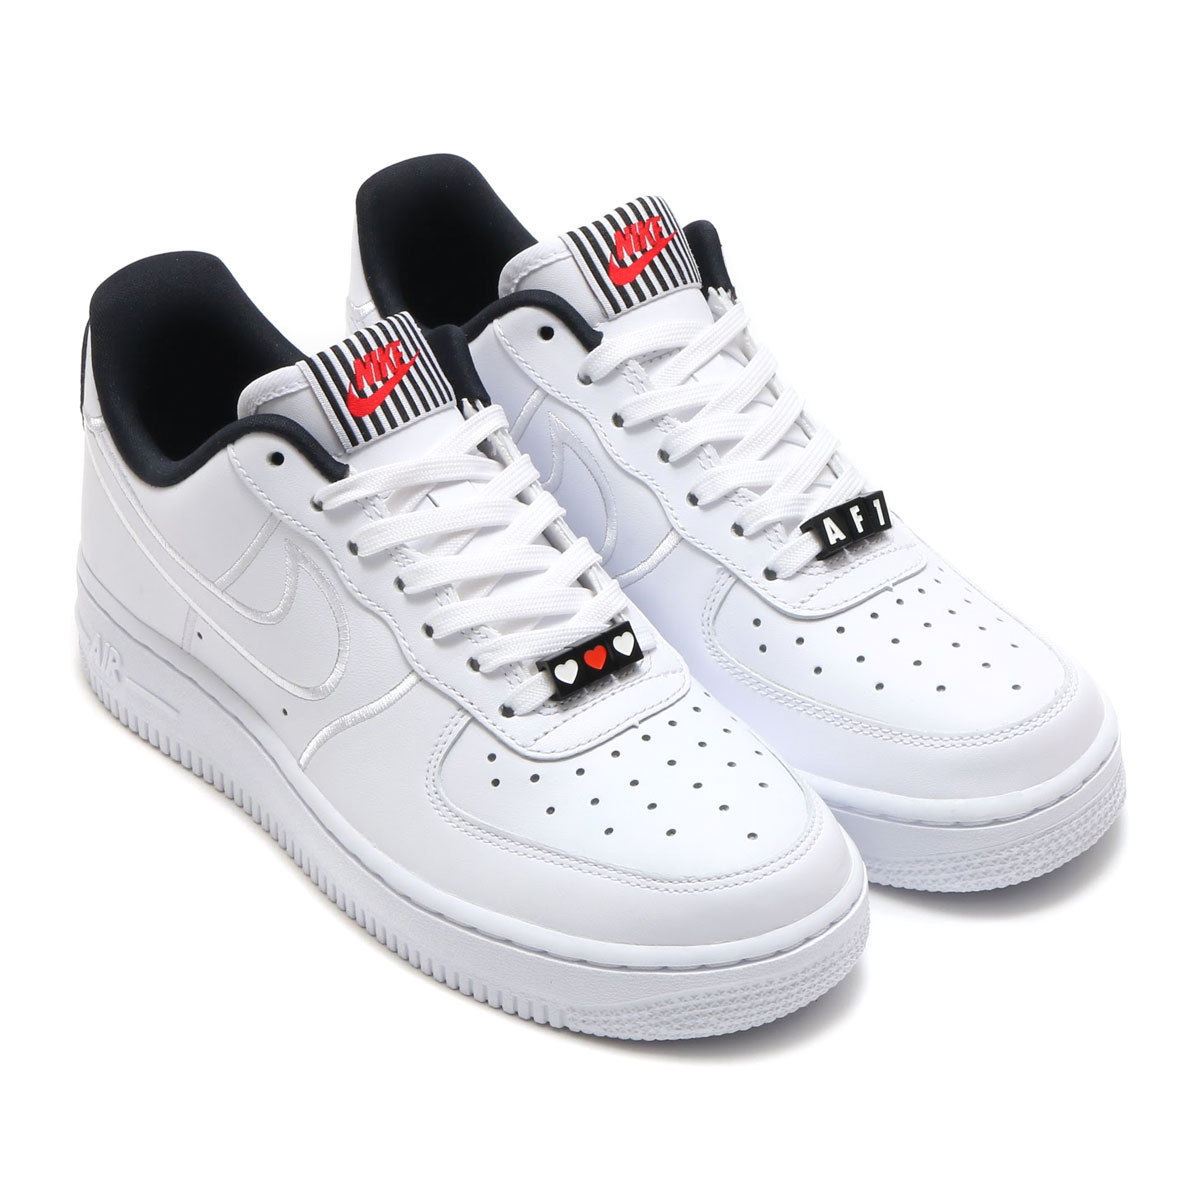 NIKE W AIR FORCE 1  07 SE LX (Nike women air force 1 07 SE LX)  (WHITE WHITE-BLACK) 18SP-S 2e295bf49